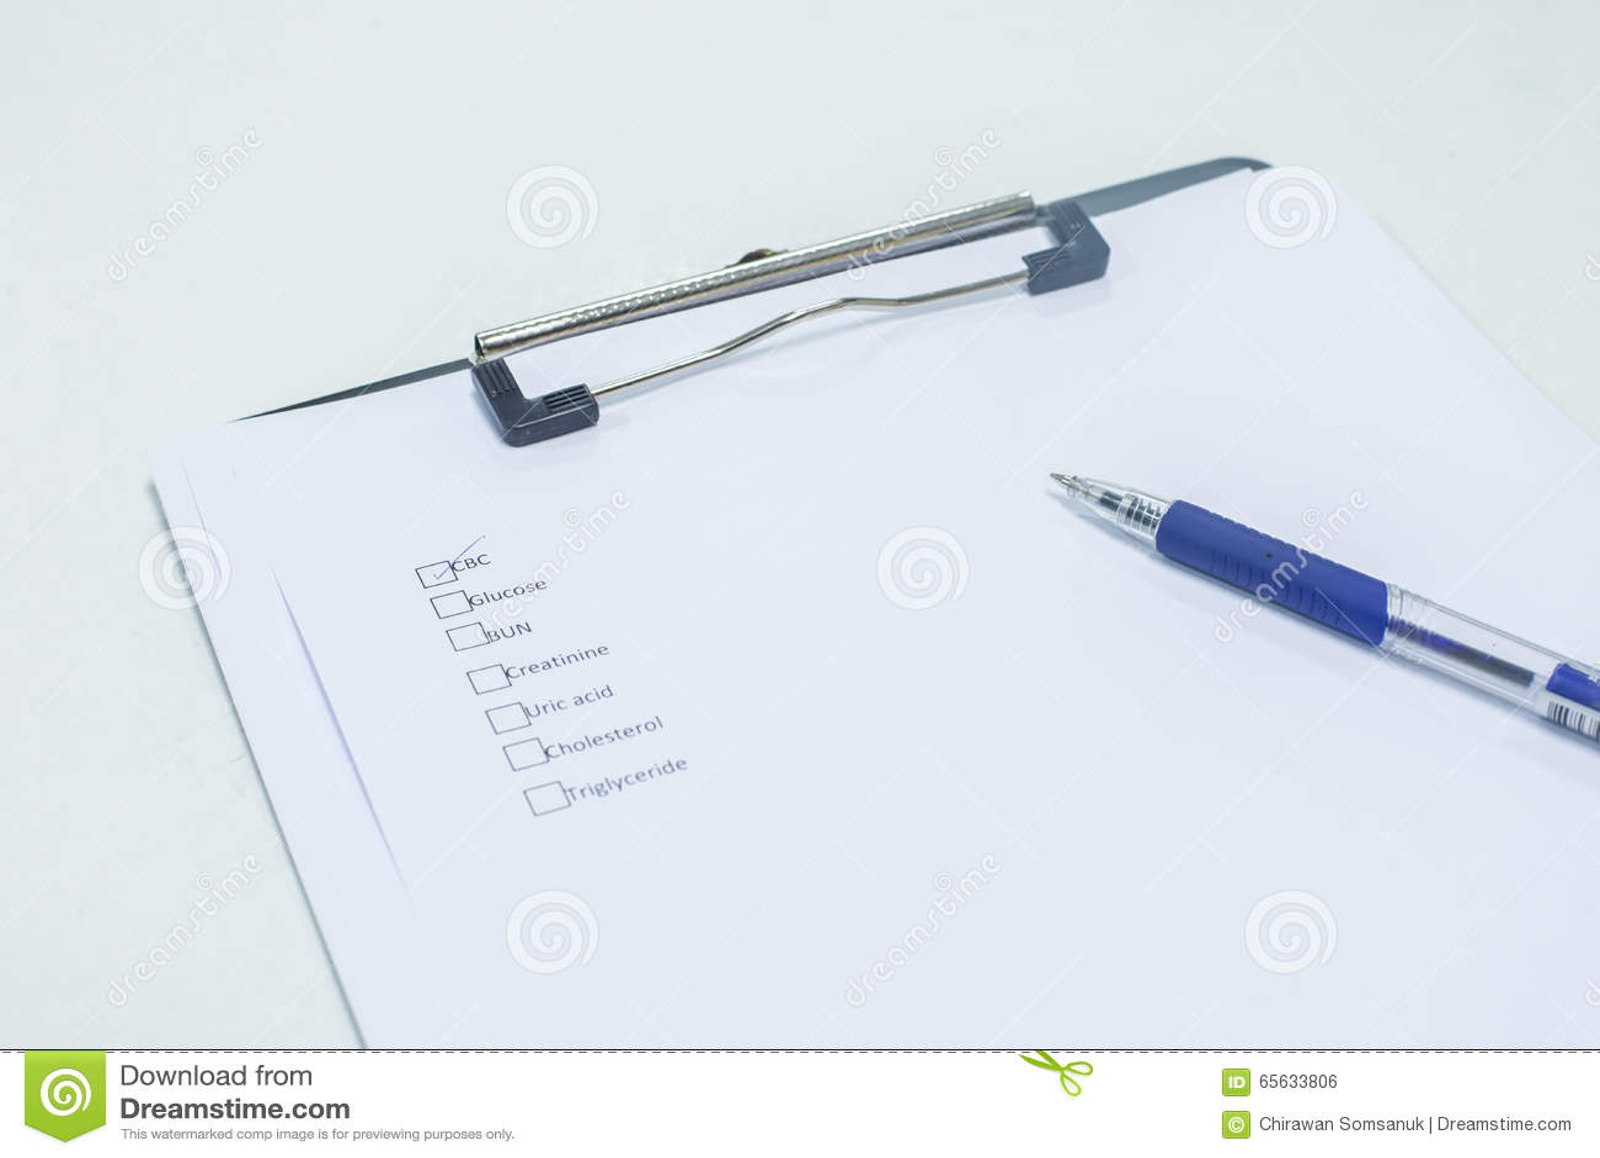 Presse-papiers, stylo